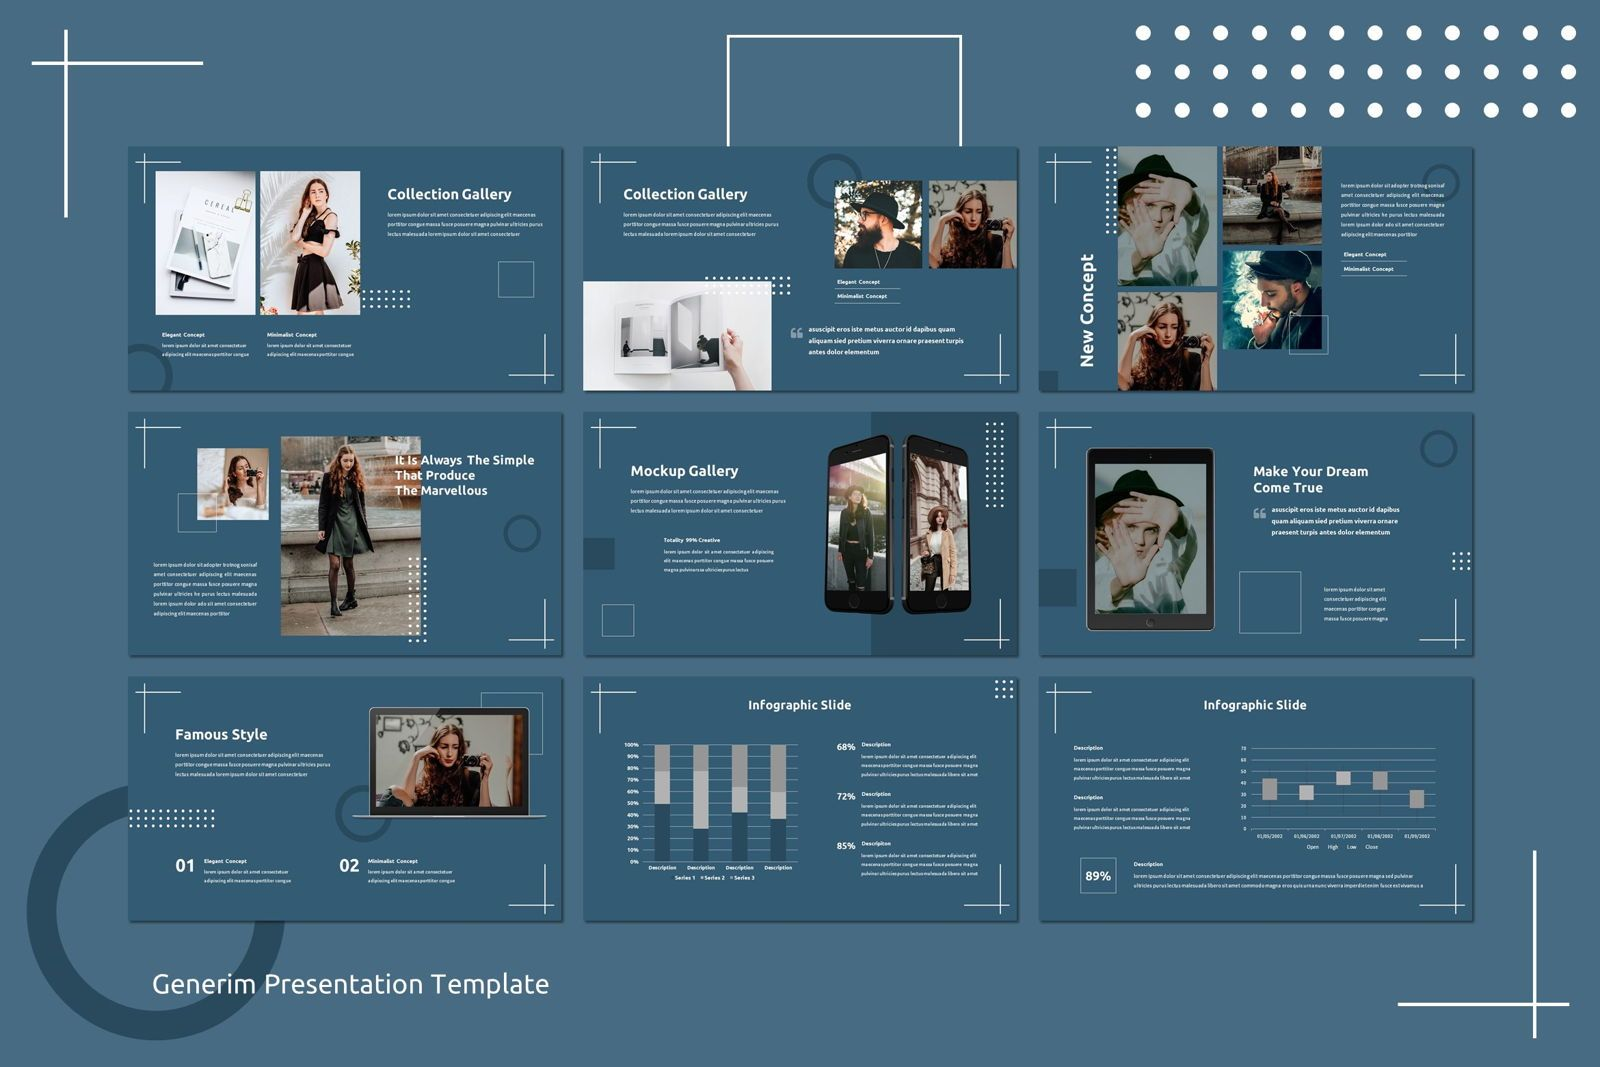 Generim - Powerpoint Template, Slide 4, 07773, Presentation Templates — PoweredTemplate.com